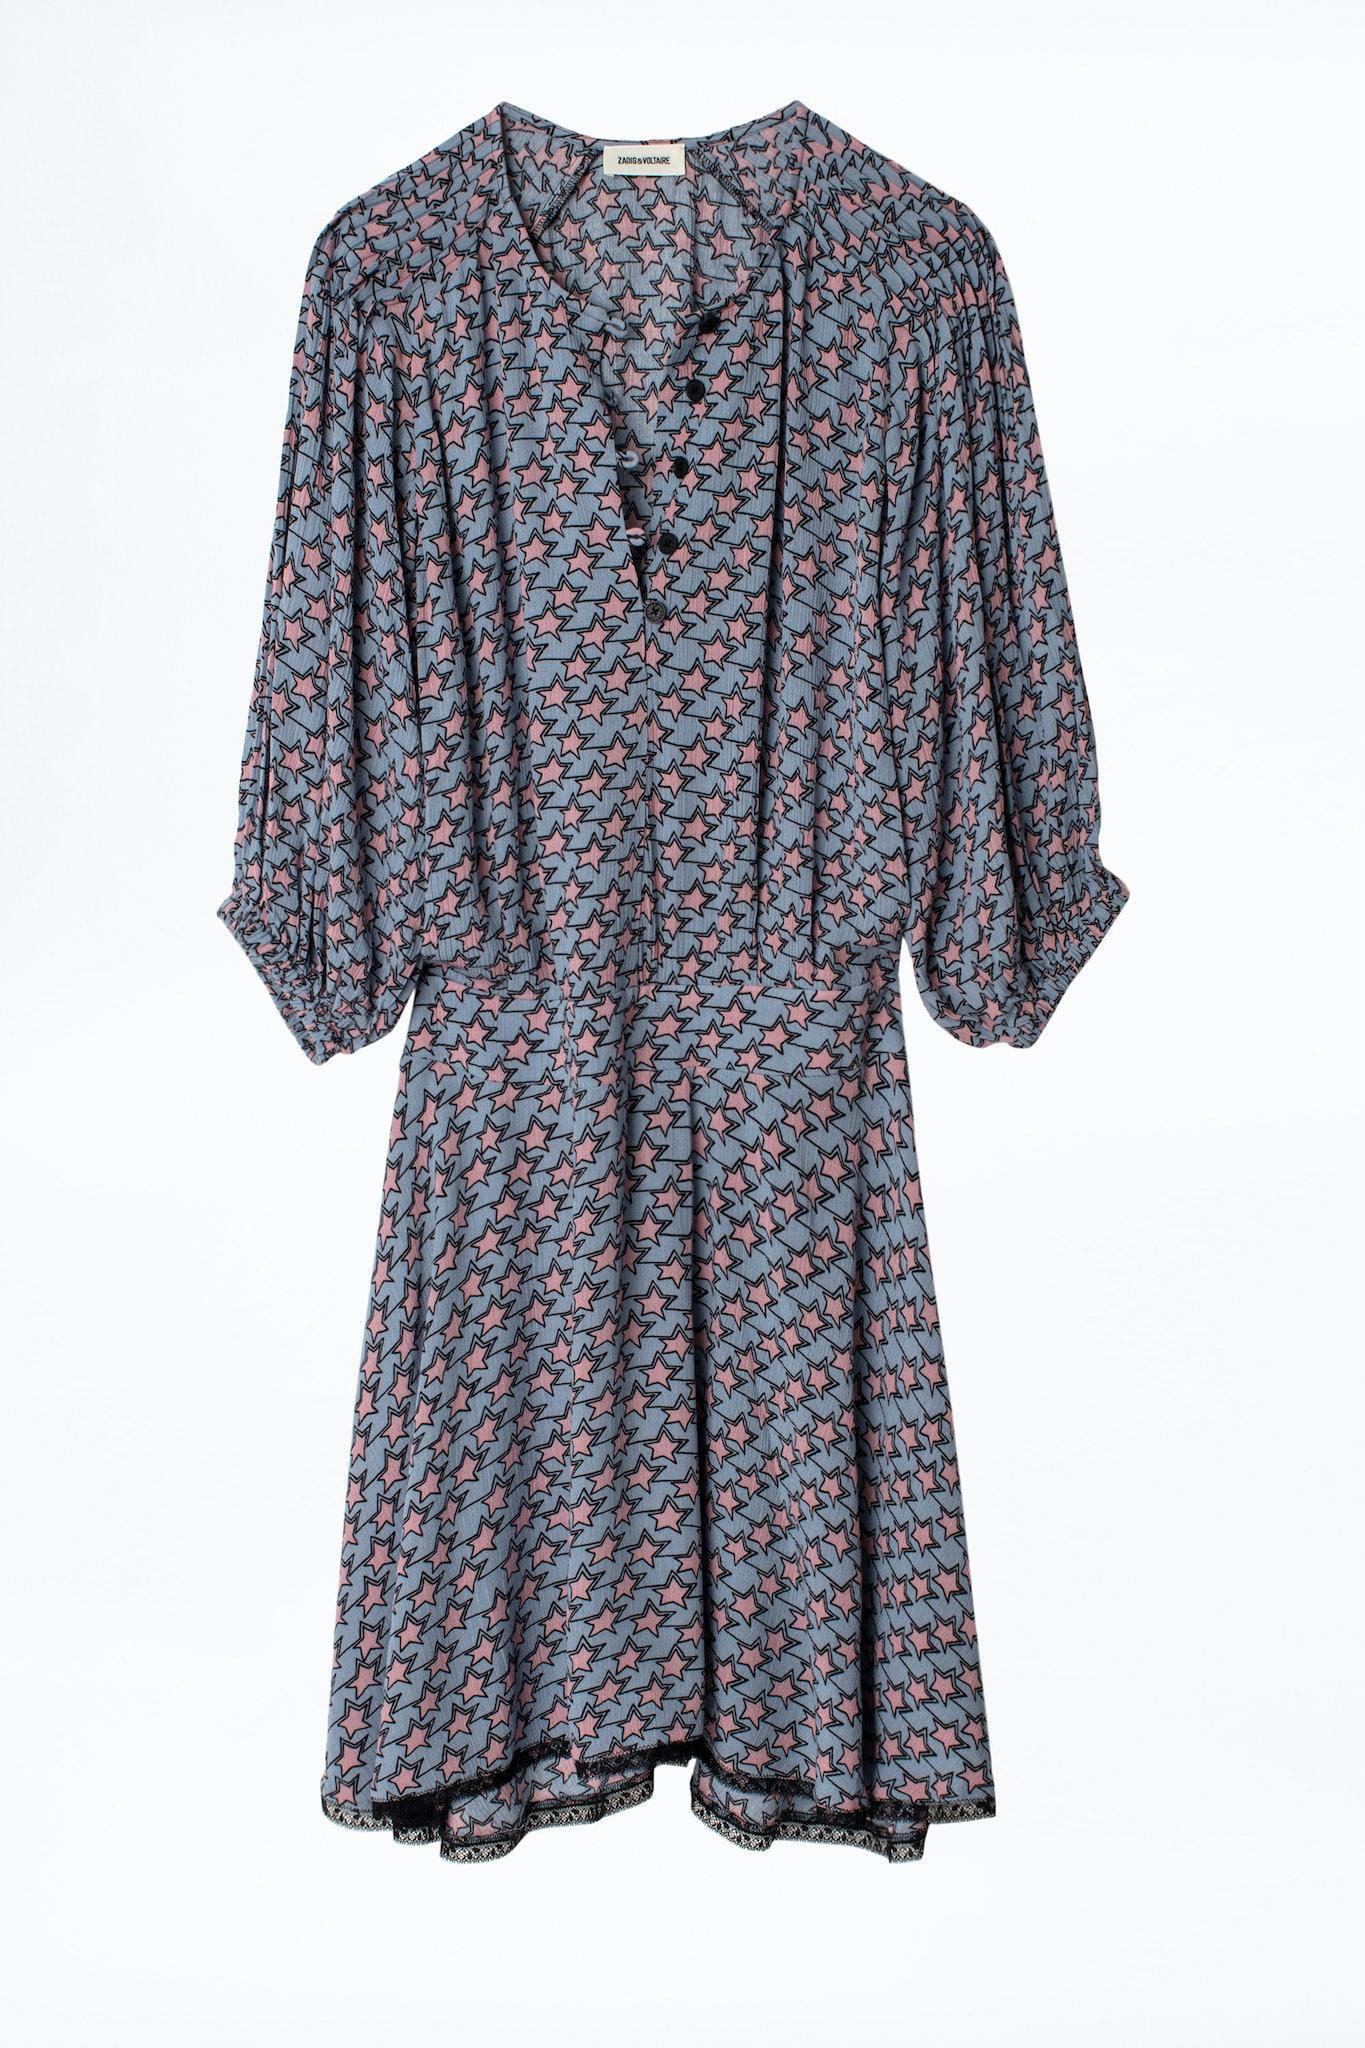 Raspali Print Etoiles Dress